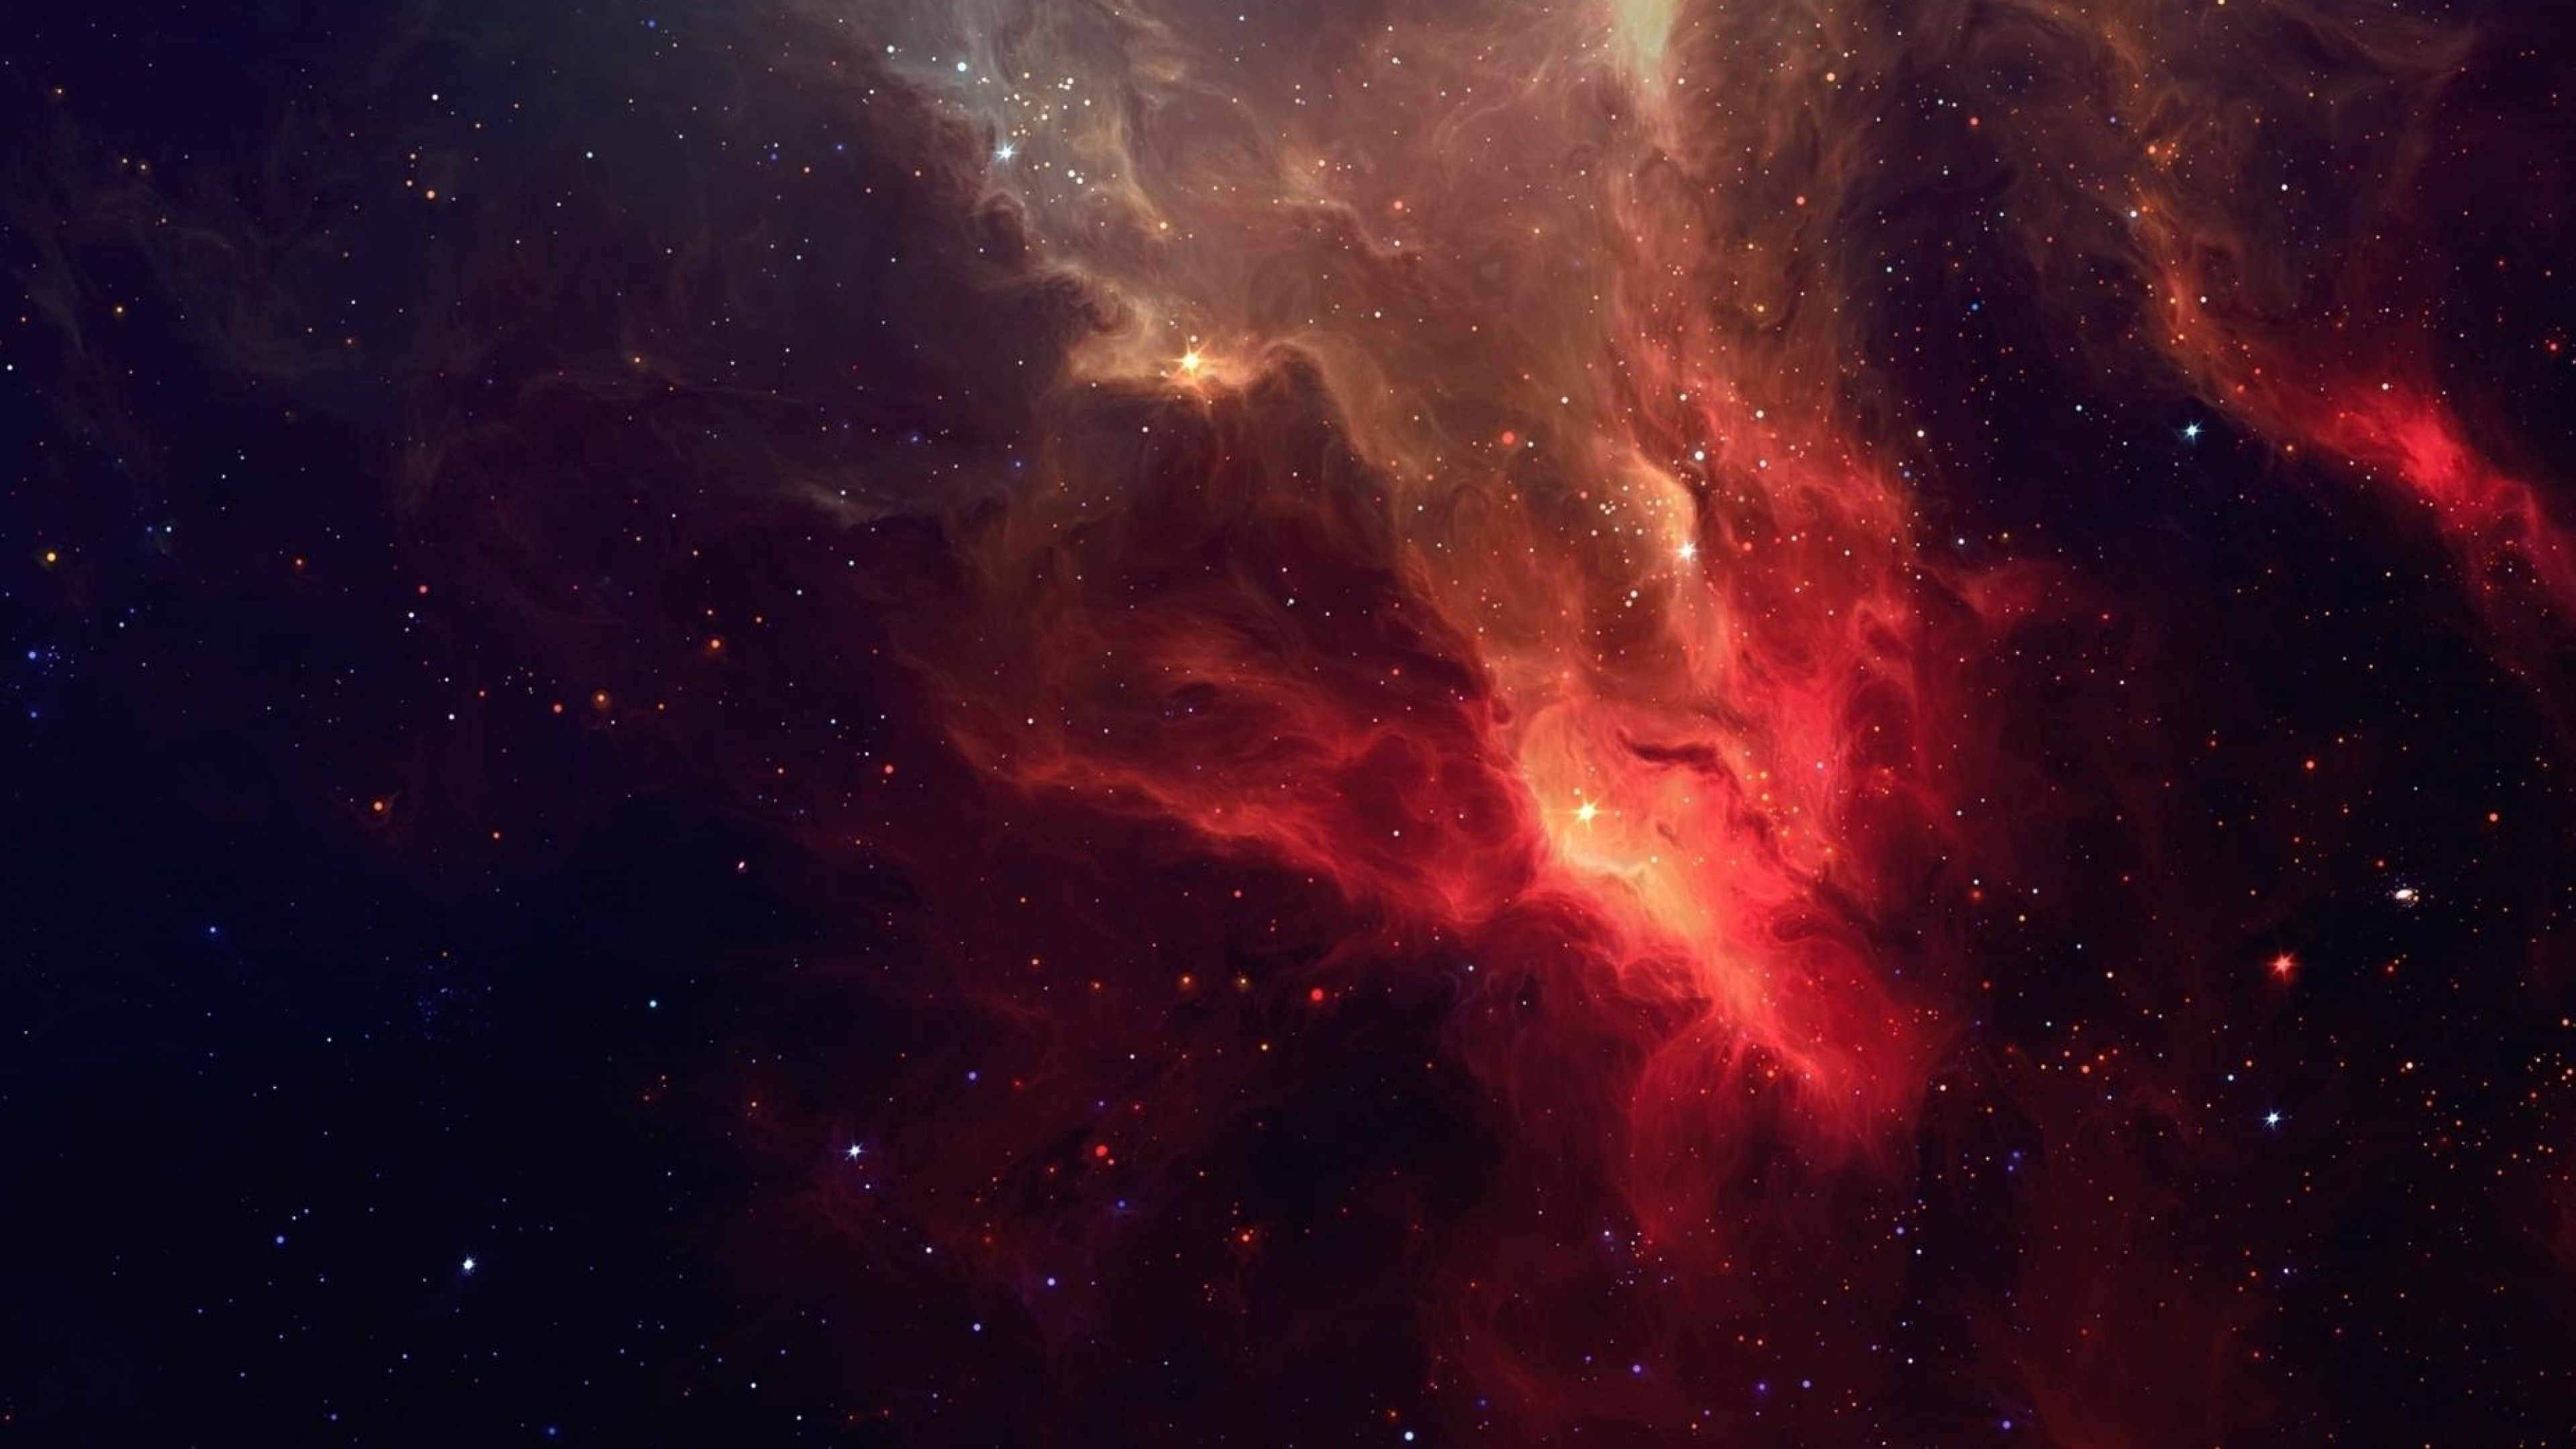 Galaxy Wallpaper 4k 48 Images